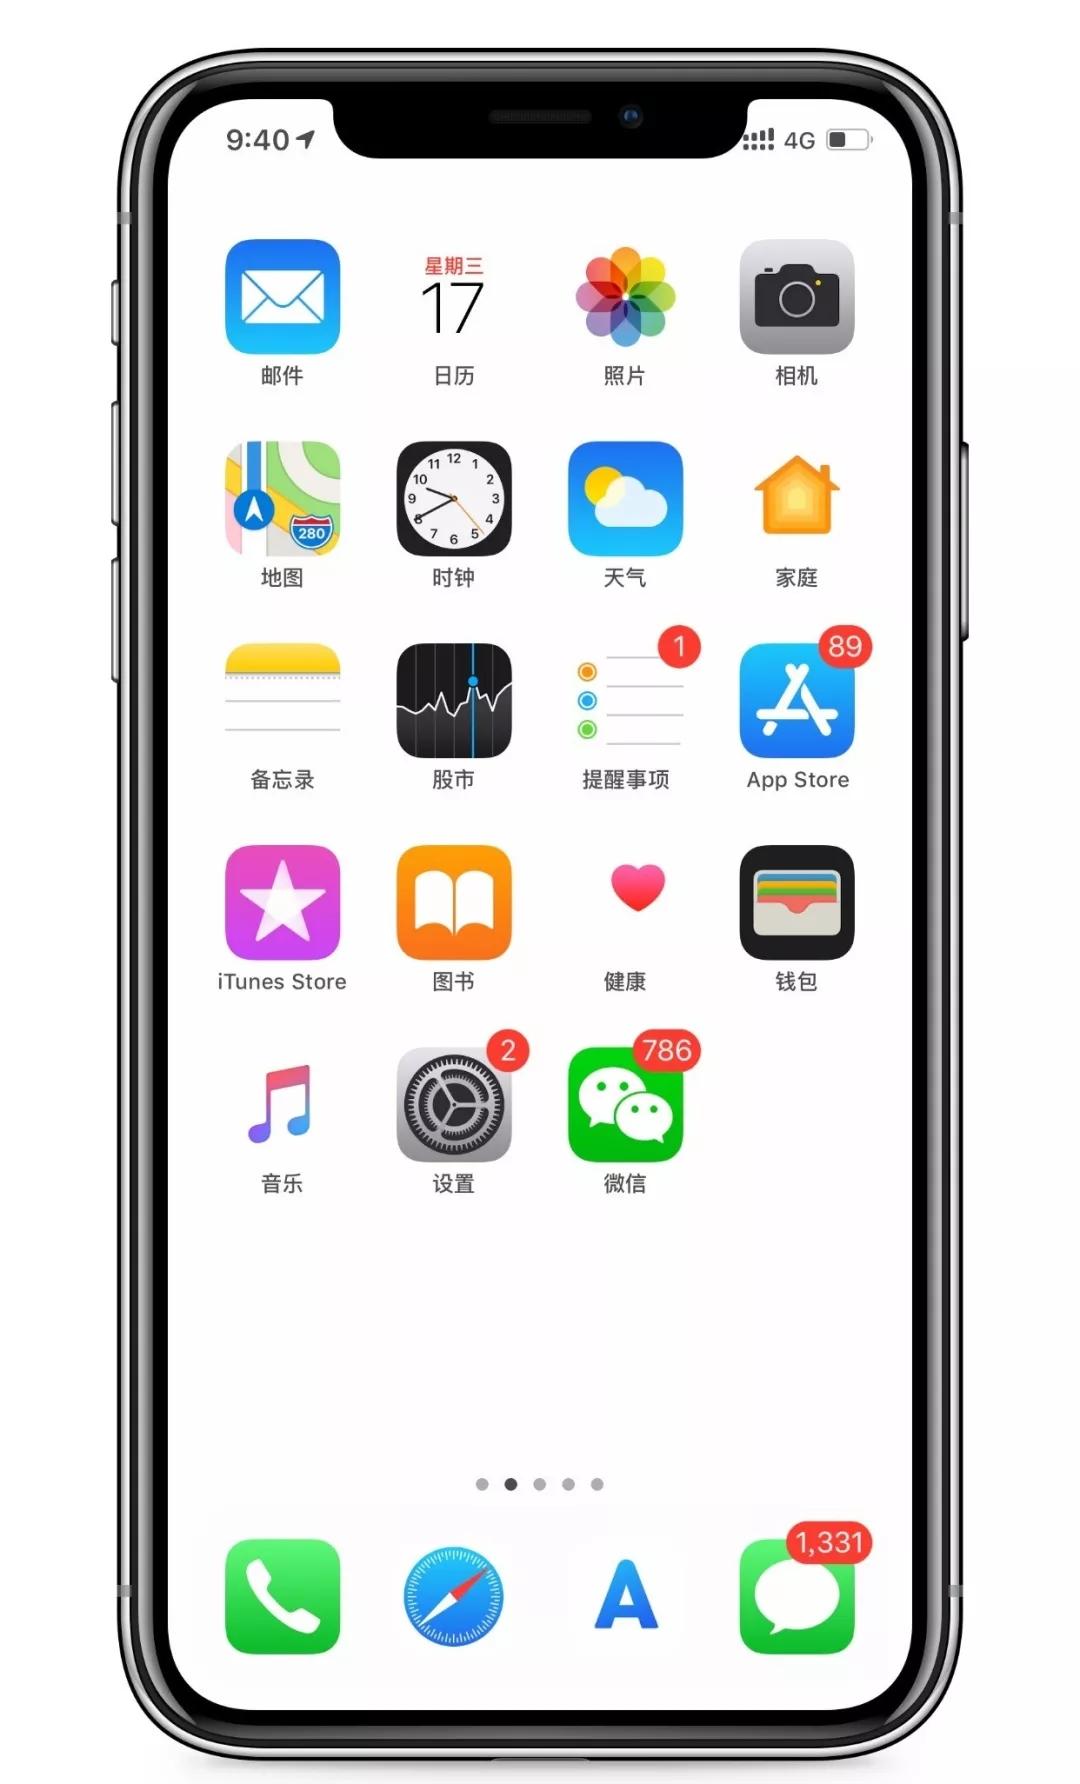 iOS12隐藏Dock栏壁纸大全 iPhone5s到MAX隐藏Dock栏壁纸全都有!